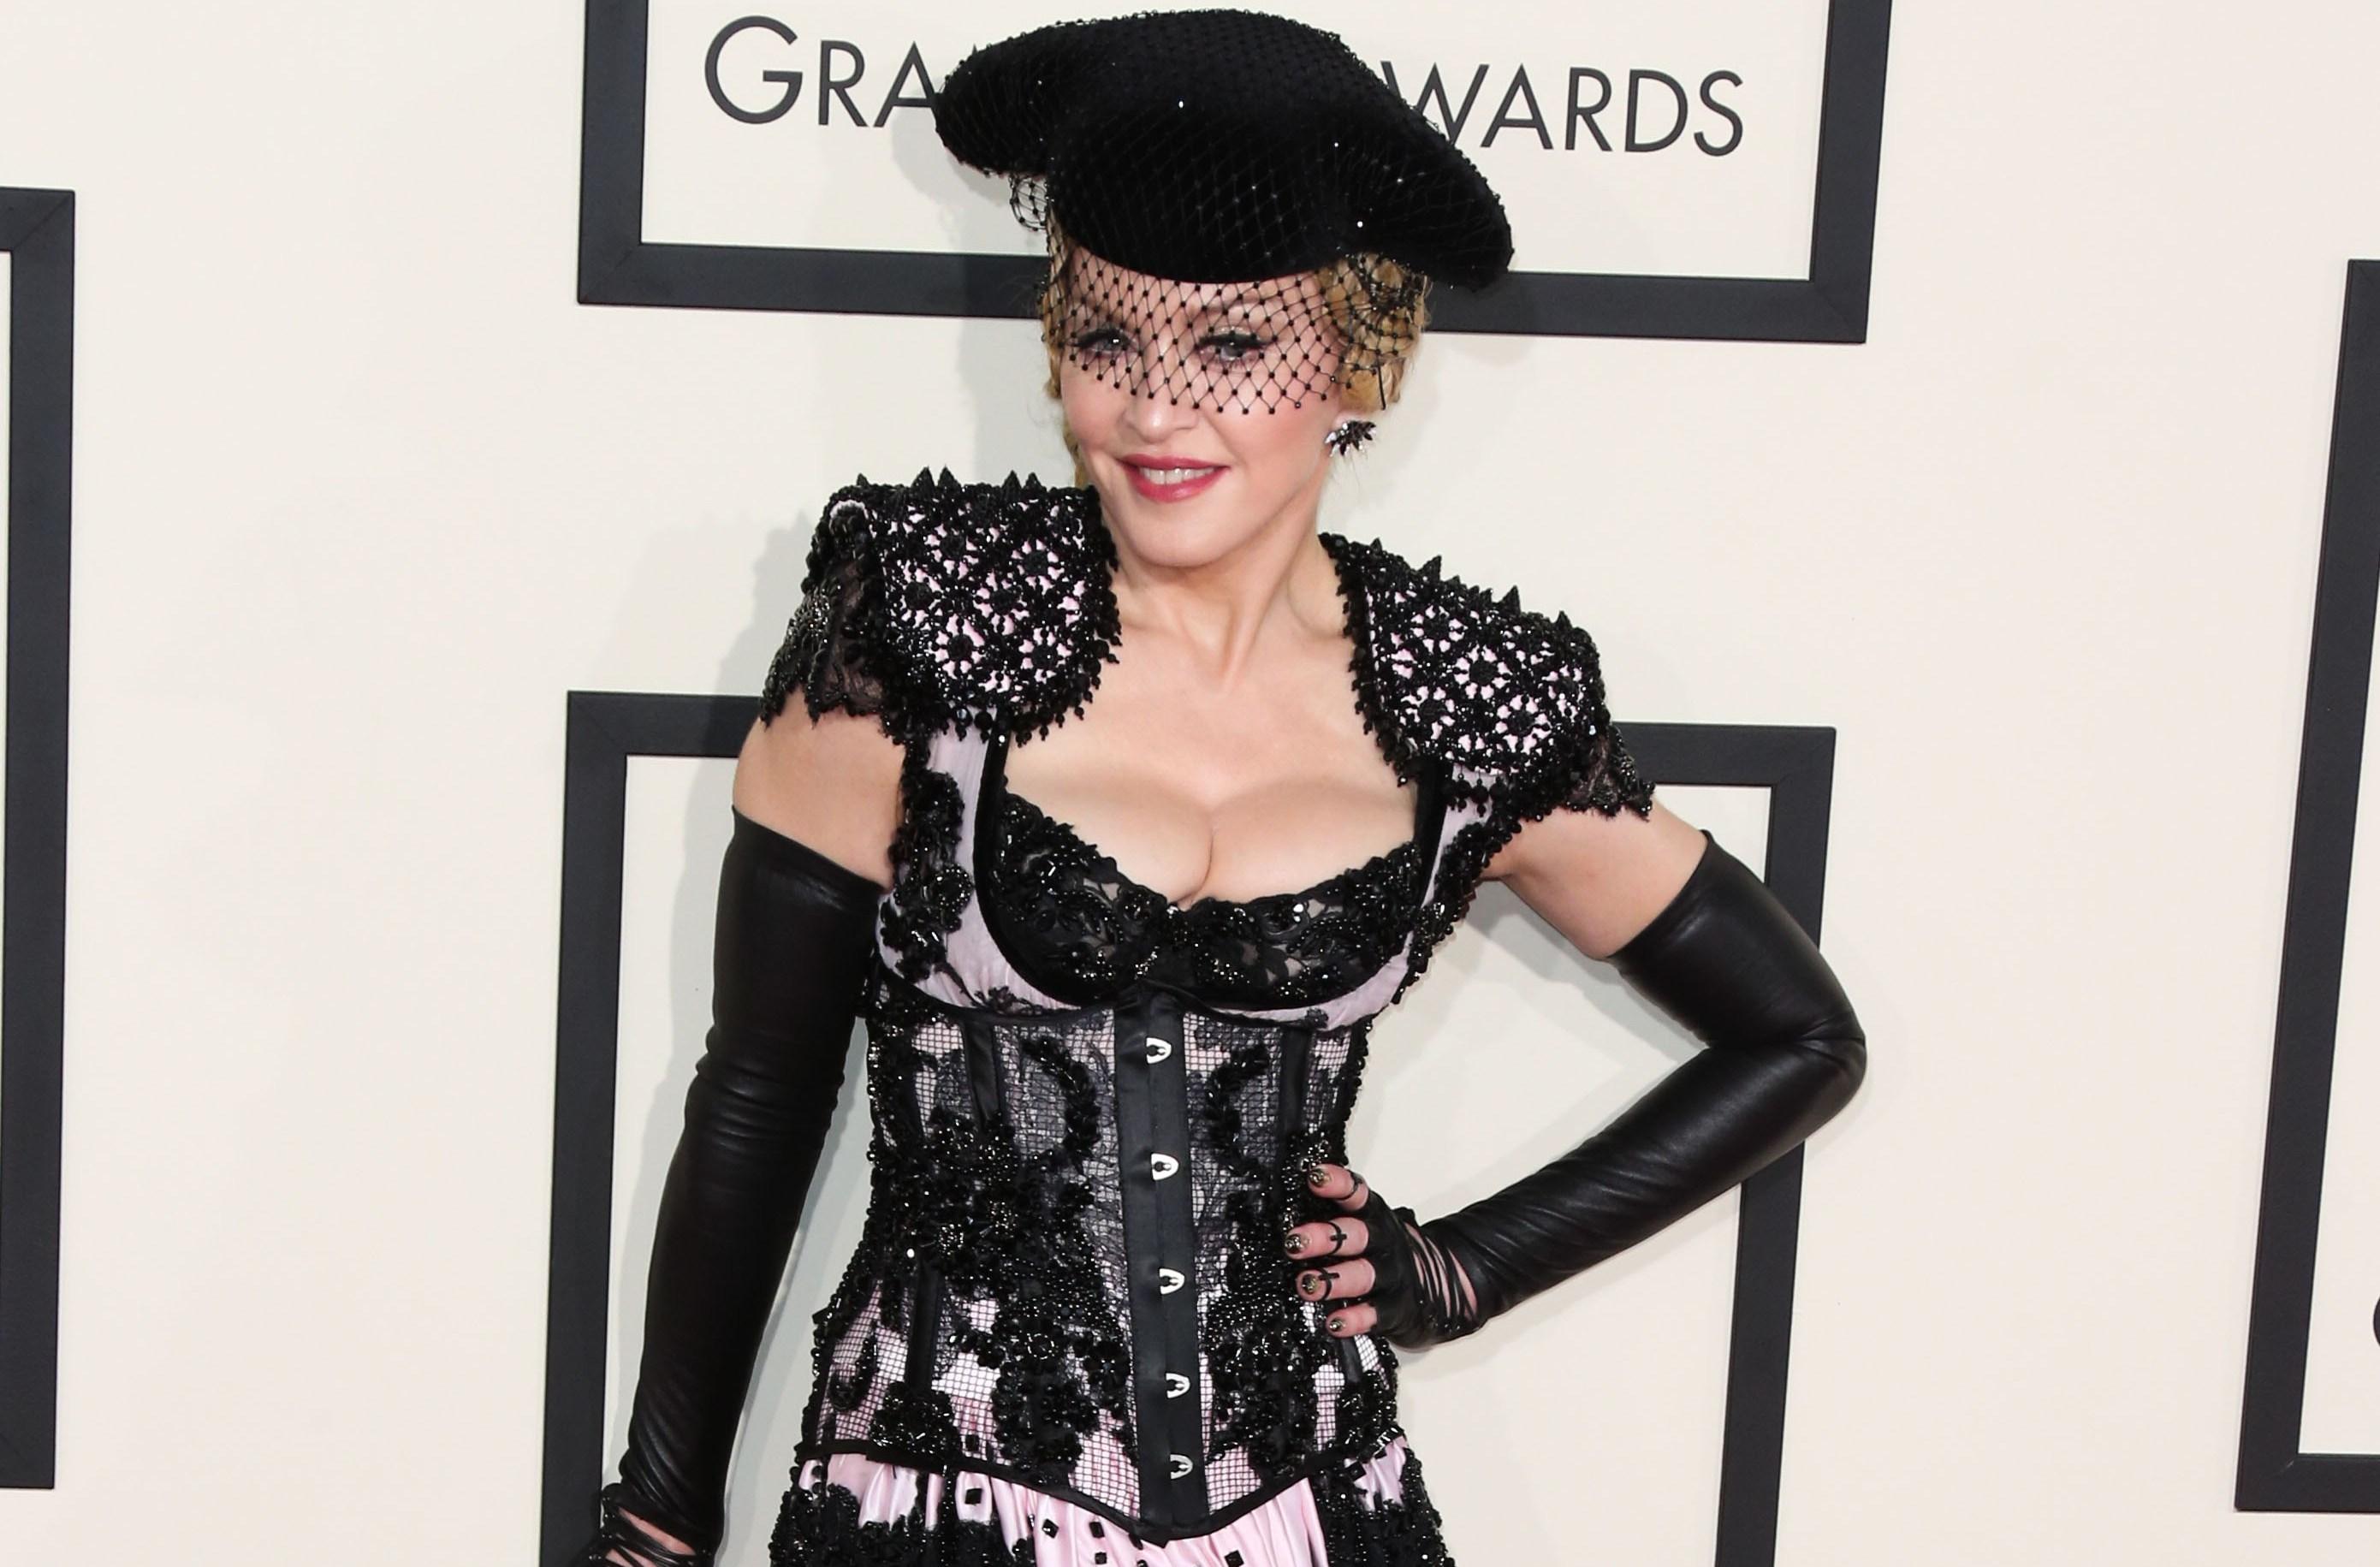 Madonna Grammy Awards